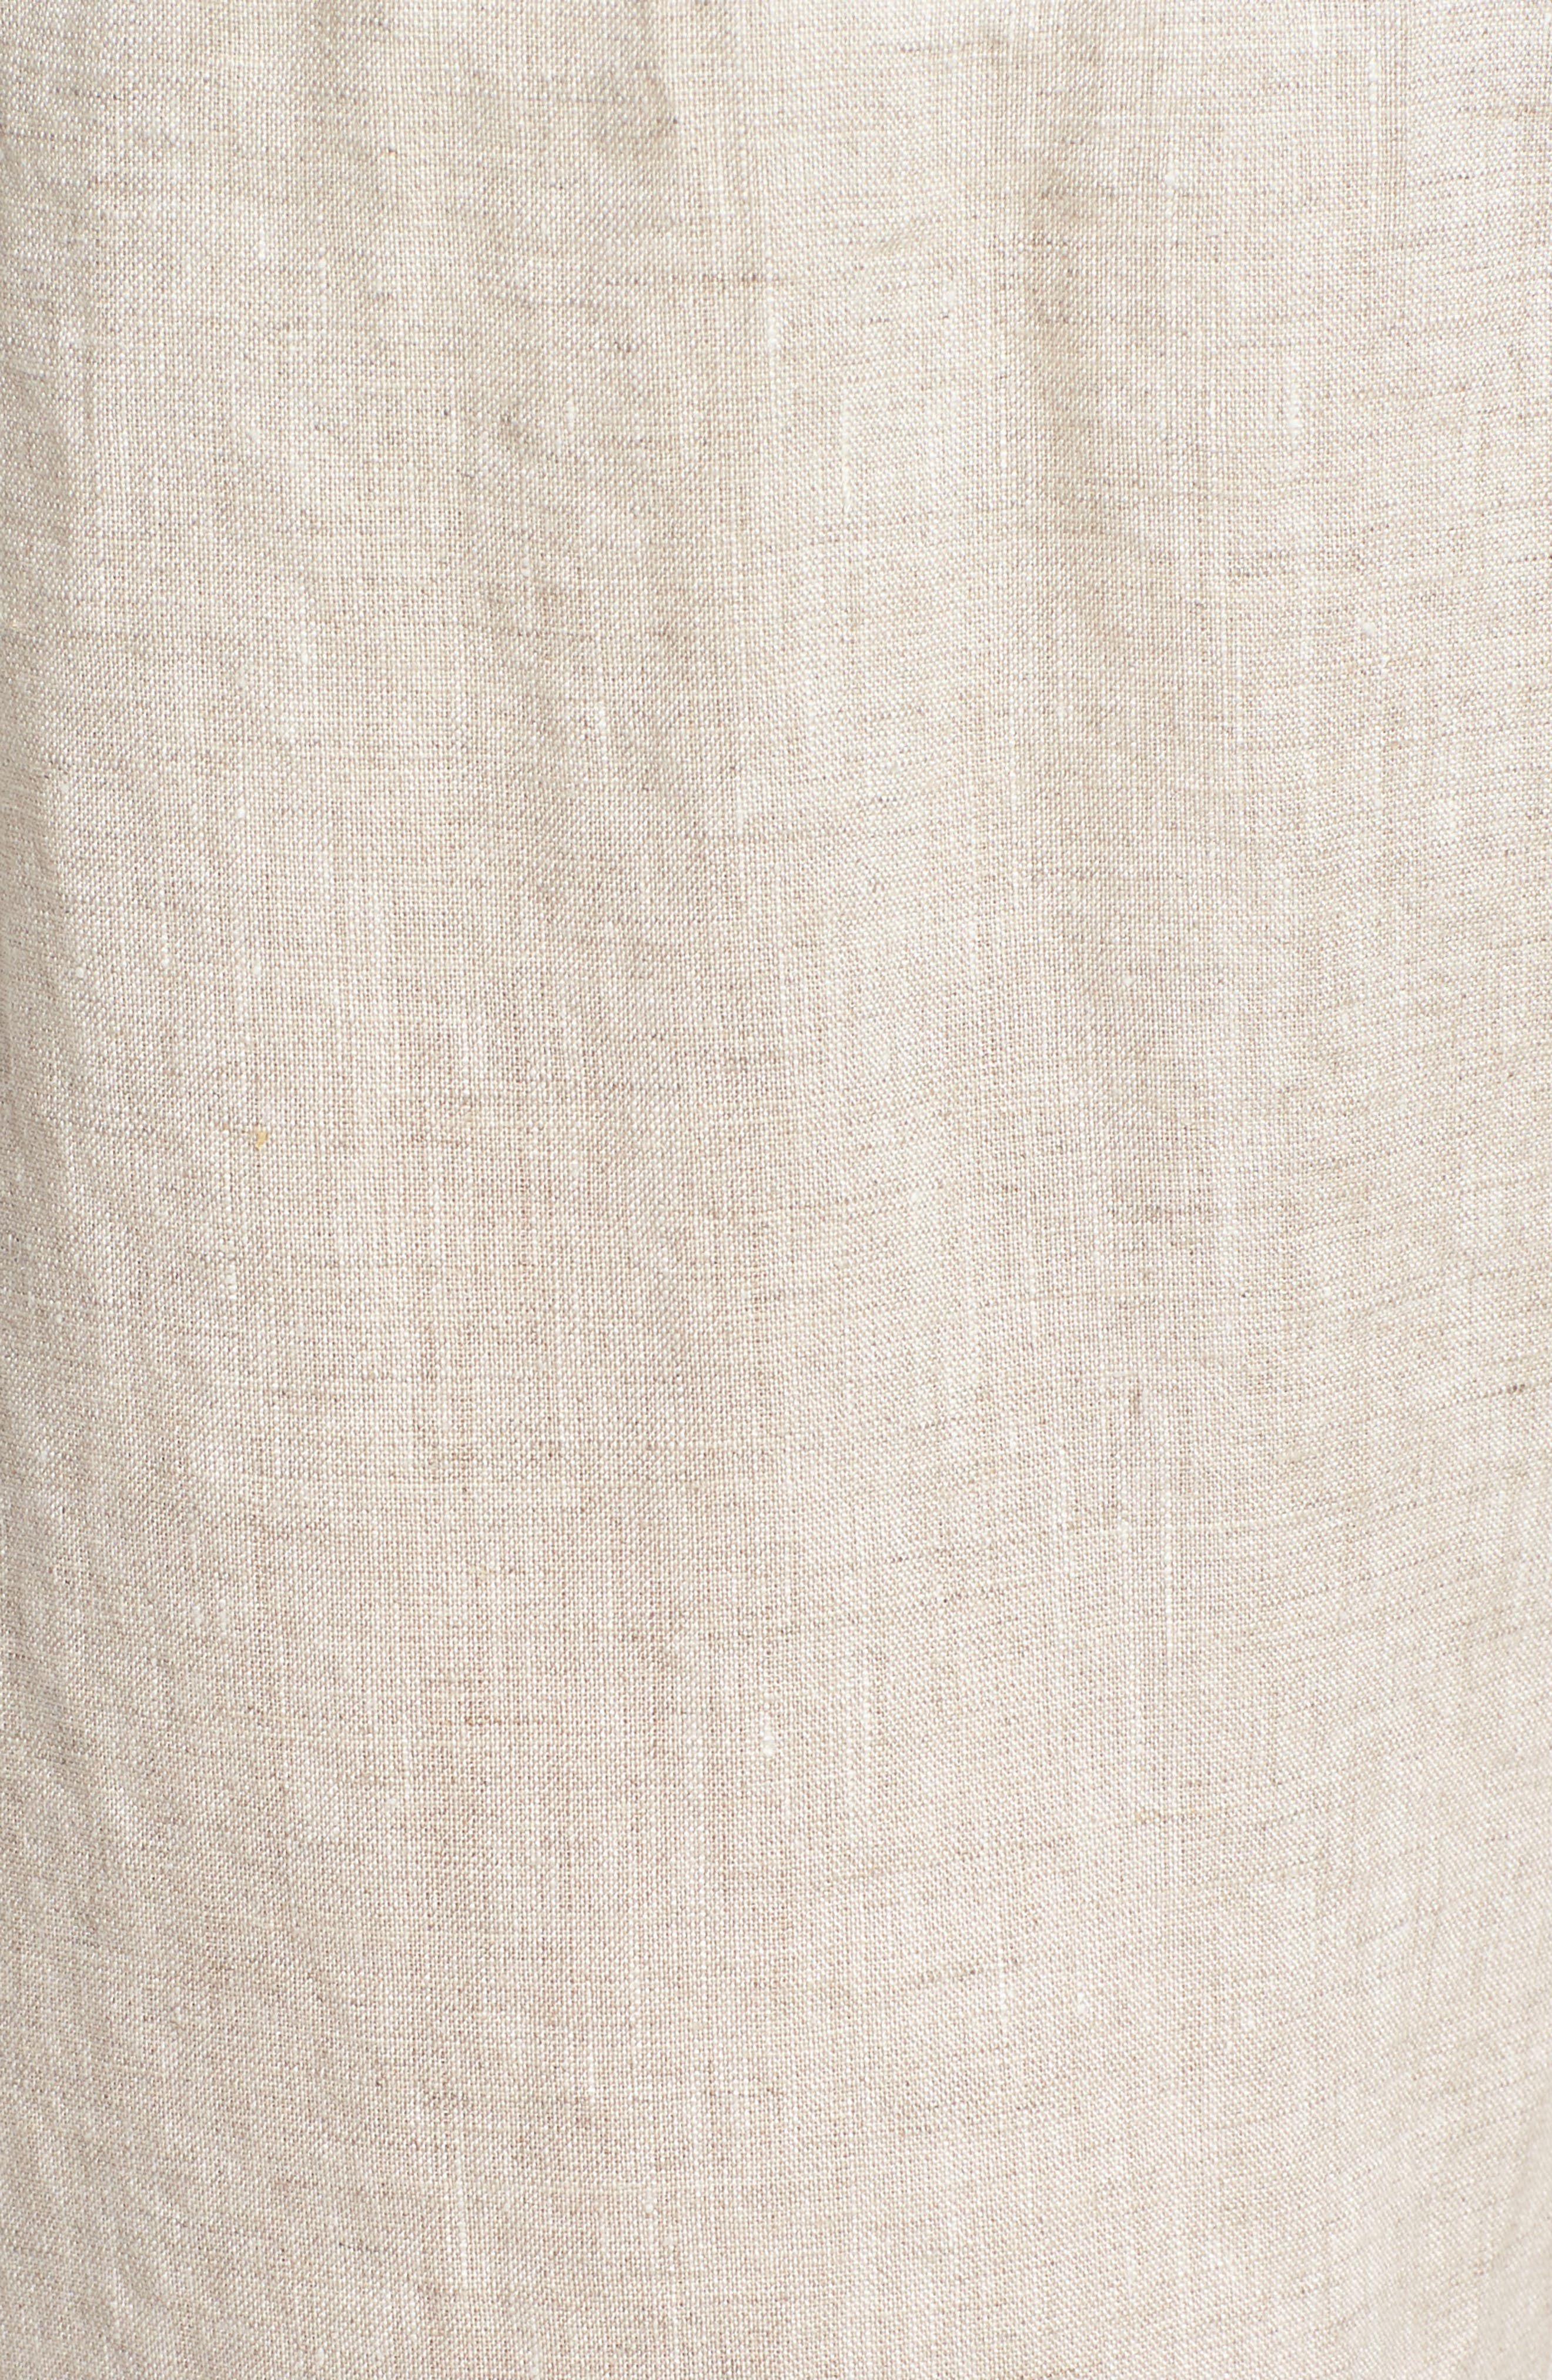 Crop Straight Leg Linen Pants,                             Alternate thumbnail 6, color,                             Natural